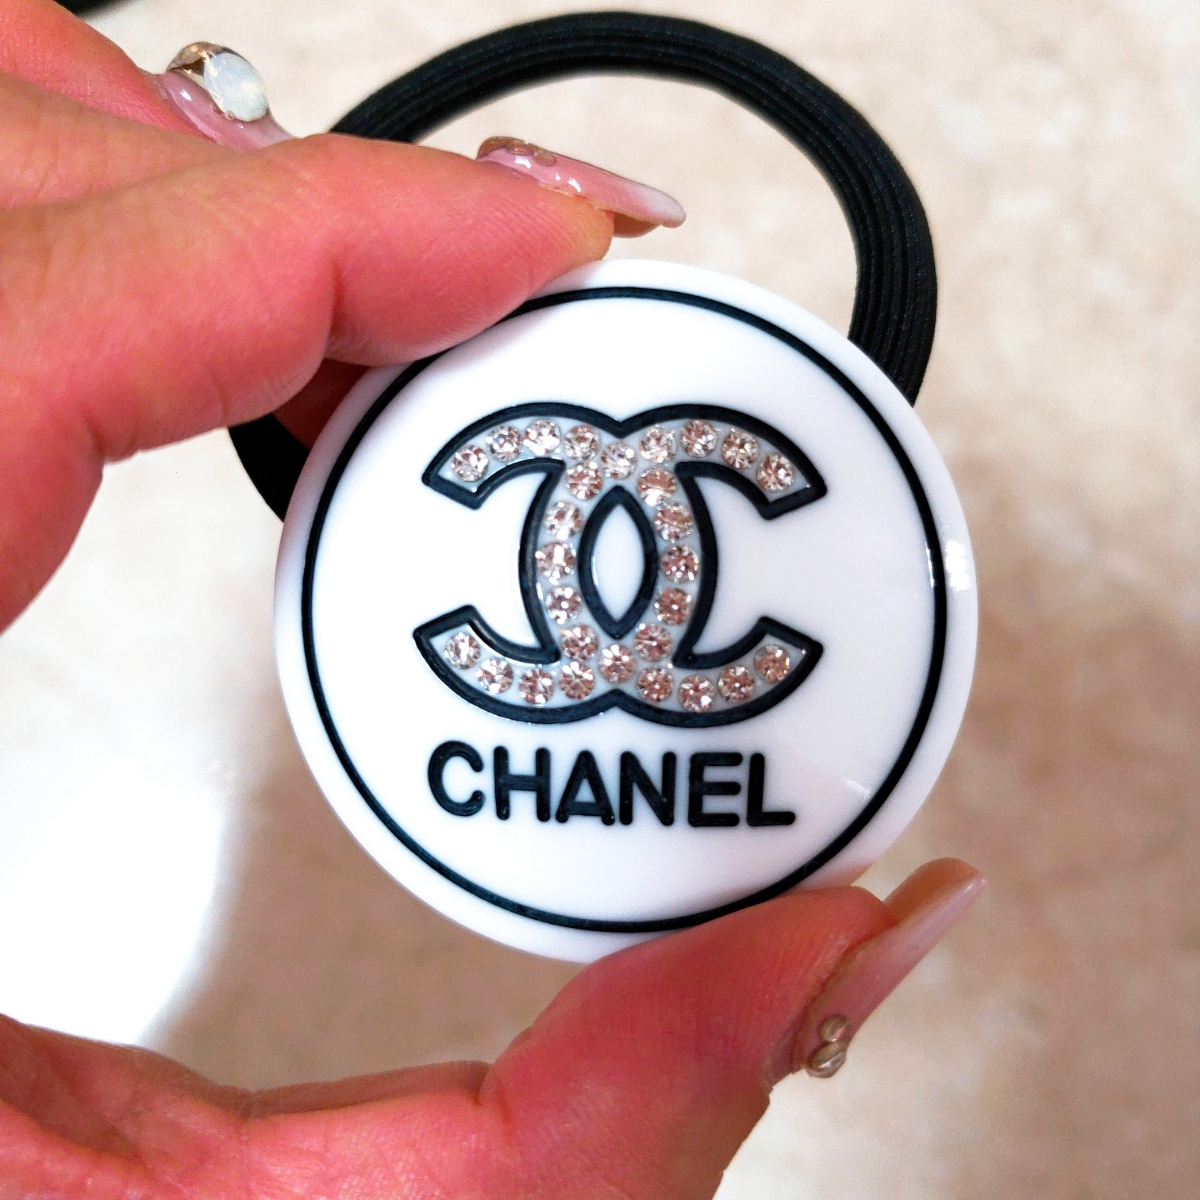 dd8096c69e41 代購代標第一品牌- 樂淘letao - CHANEL シャネルヘアゴムロゴストーン白新品未使用